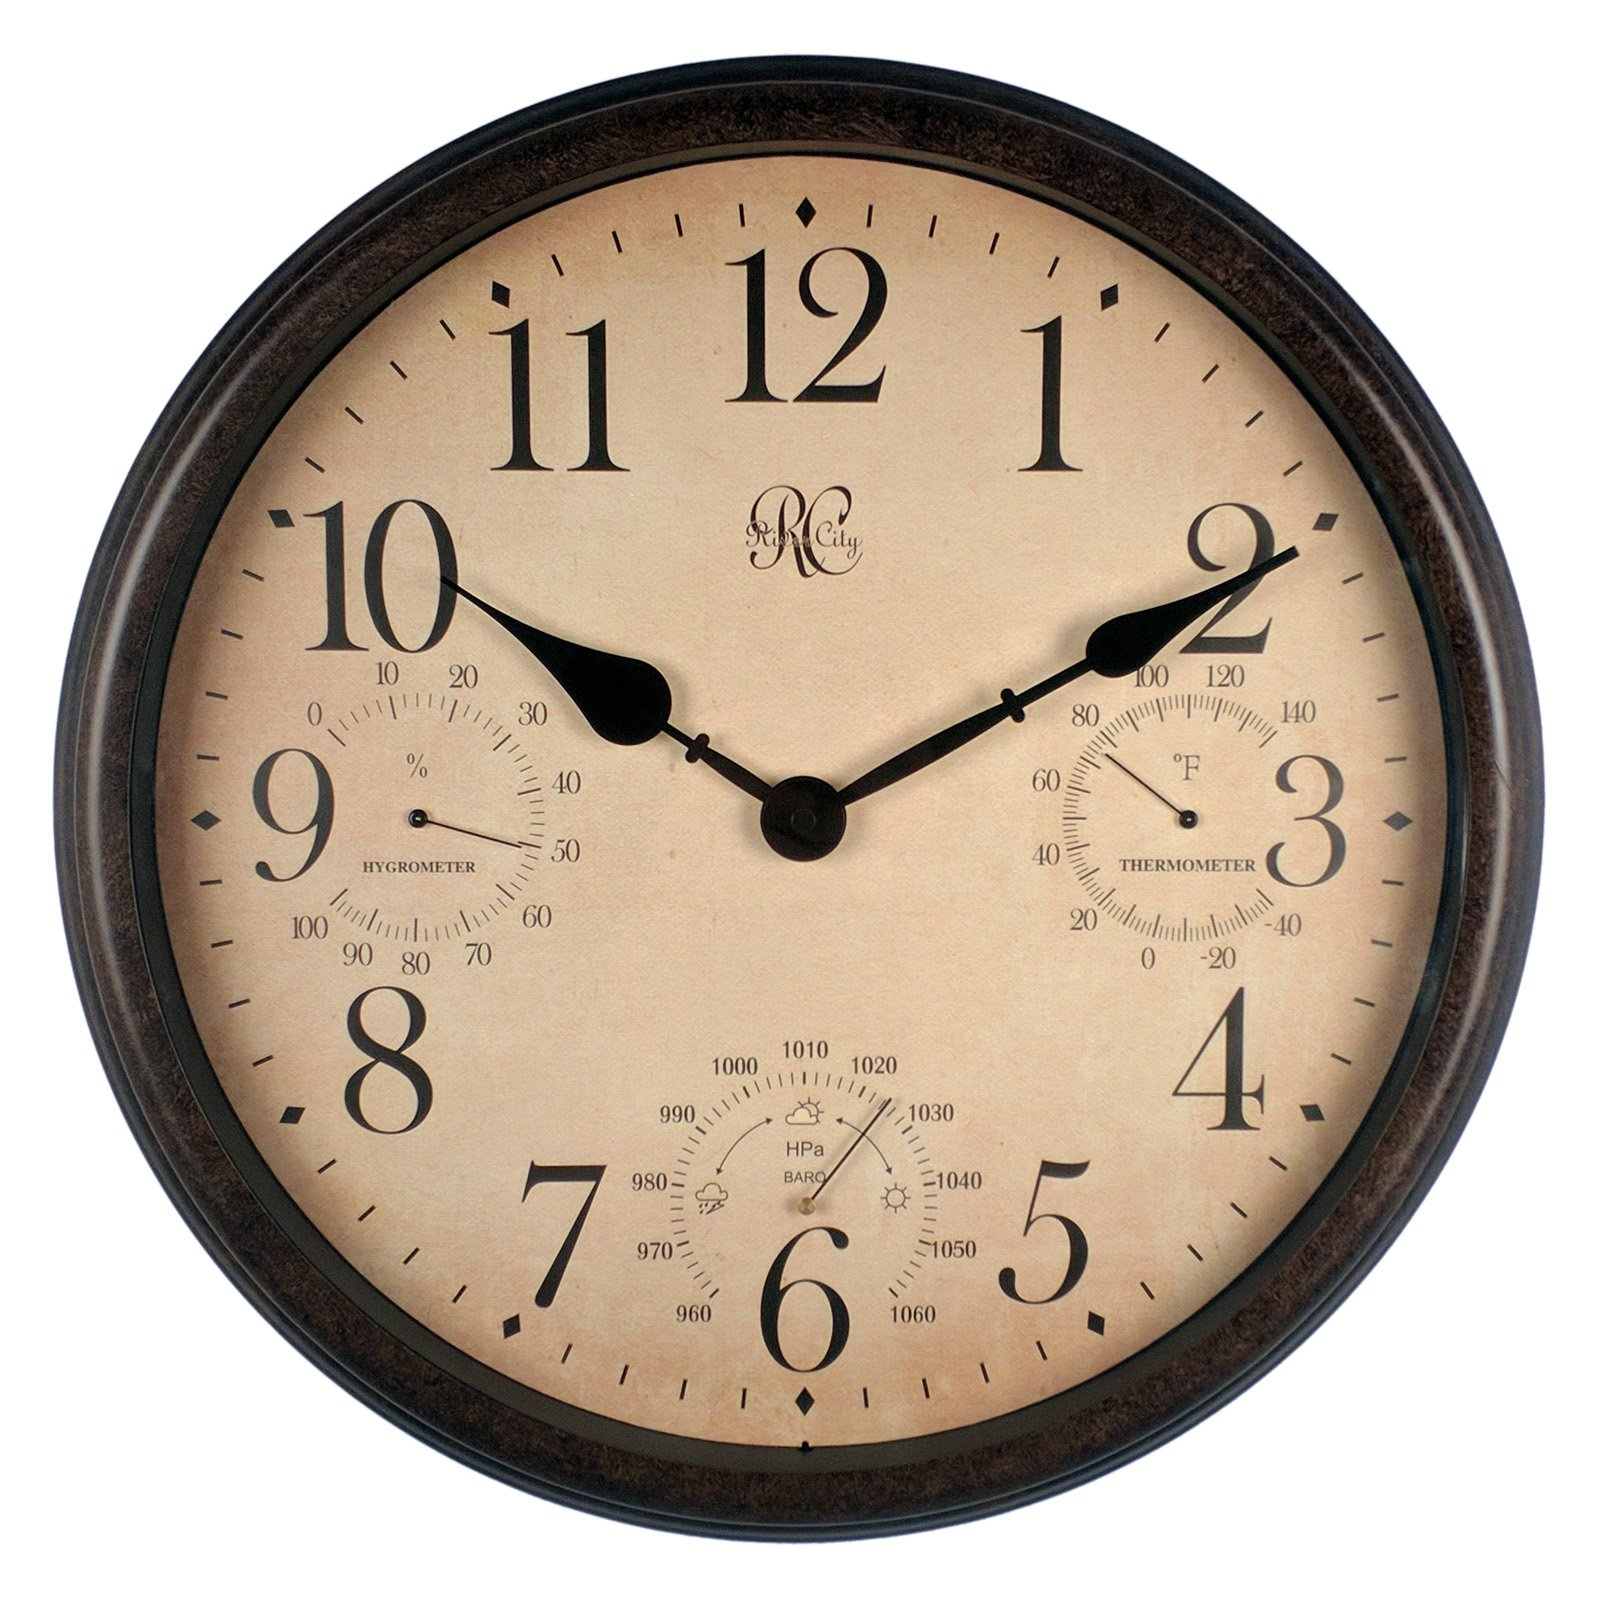 River City Clocks 16 in. Metal Outdoor Clock by River City Clocks